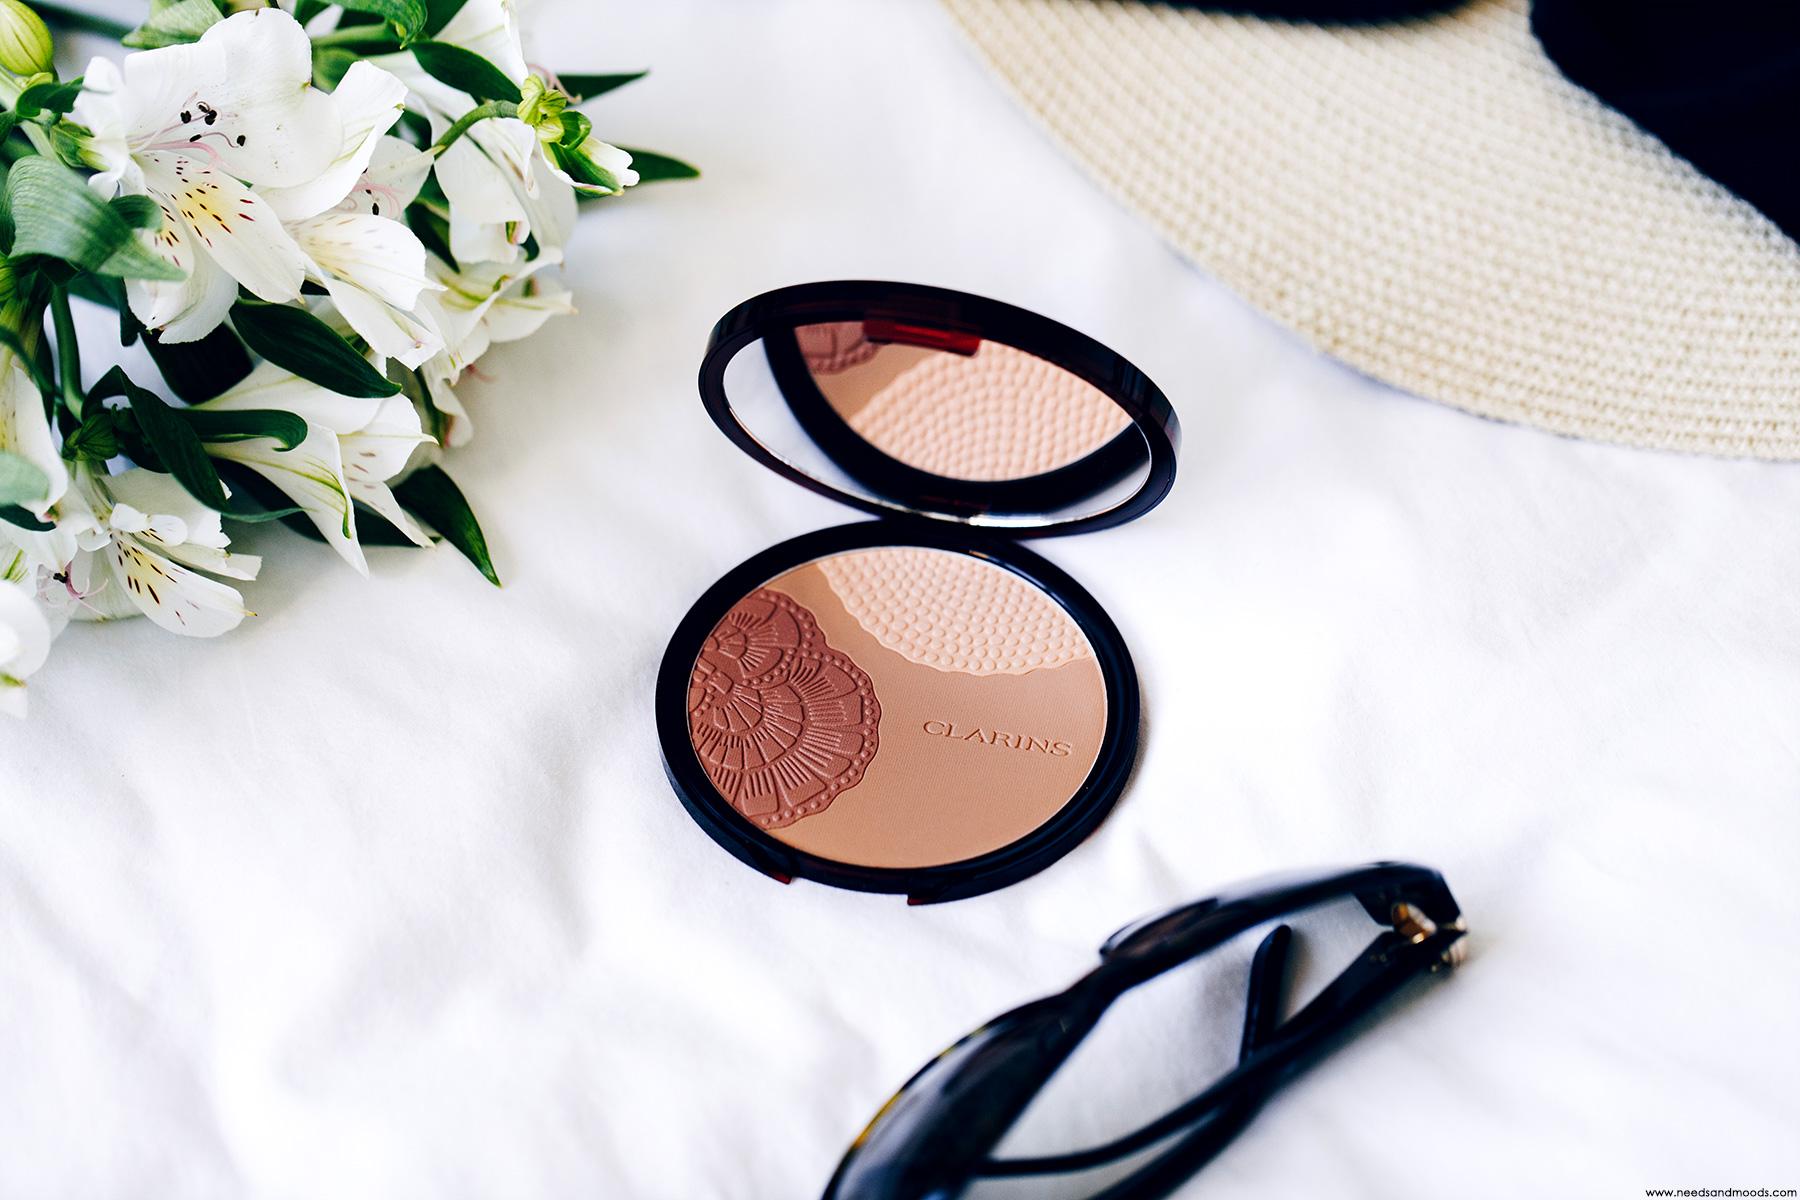 clarins bronzing compact summer 2019